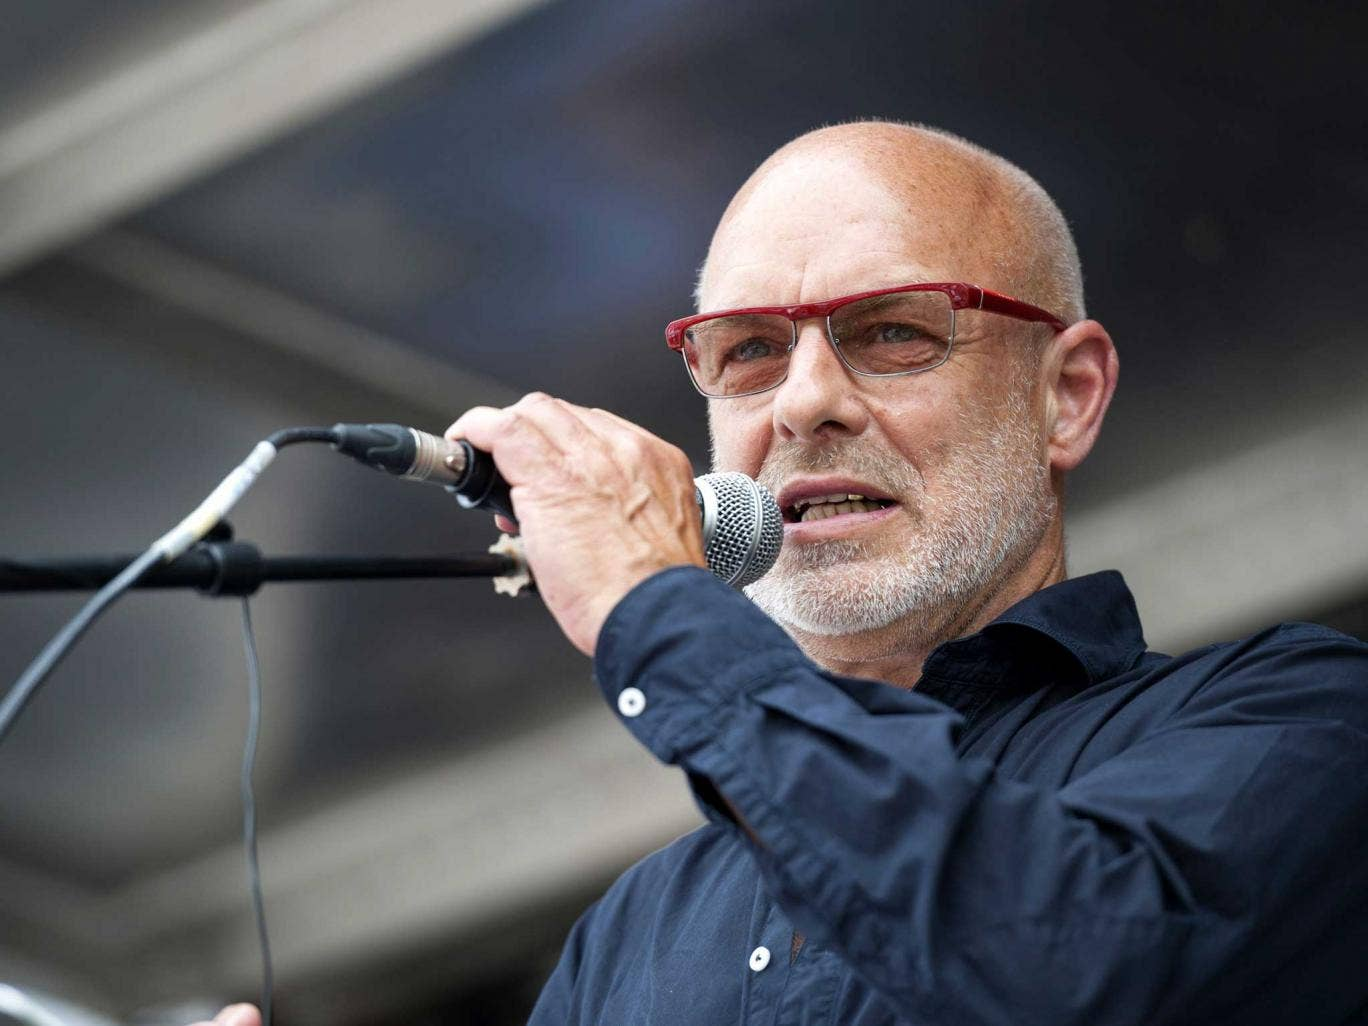 The John Peel Lecture, 6 Music, Review: Brian Eno Focused